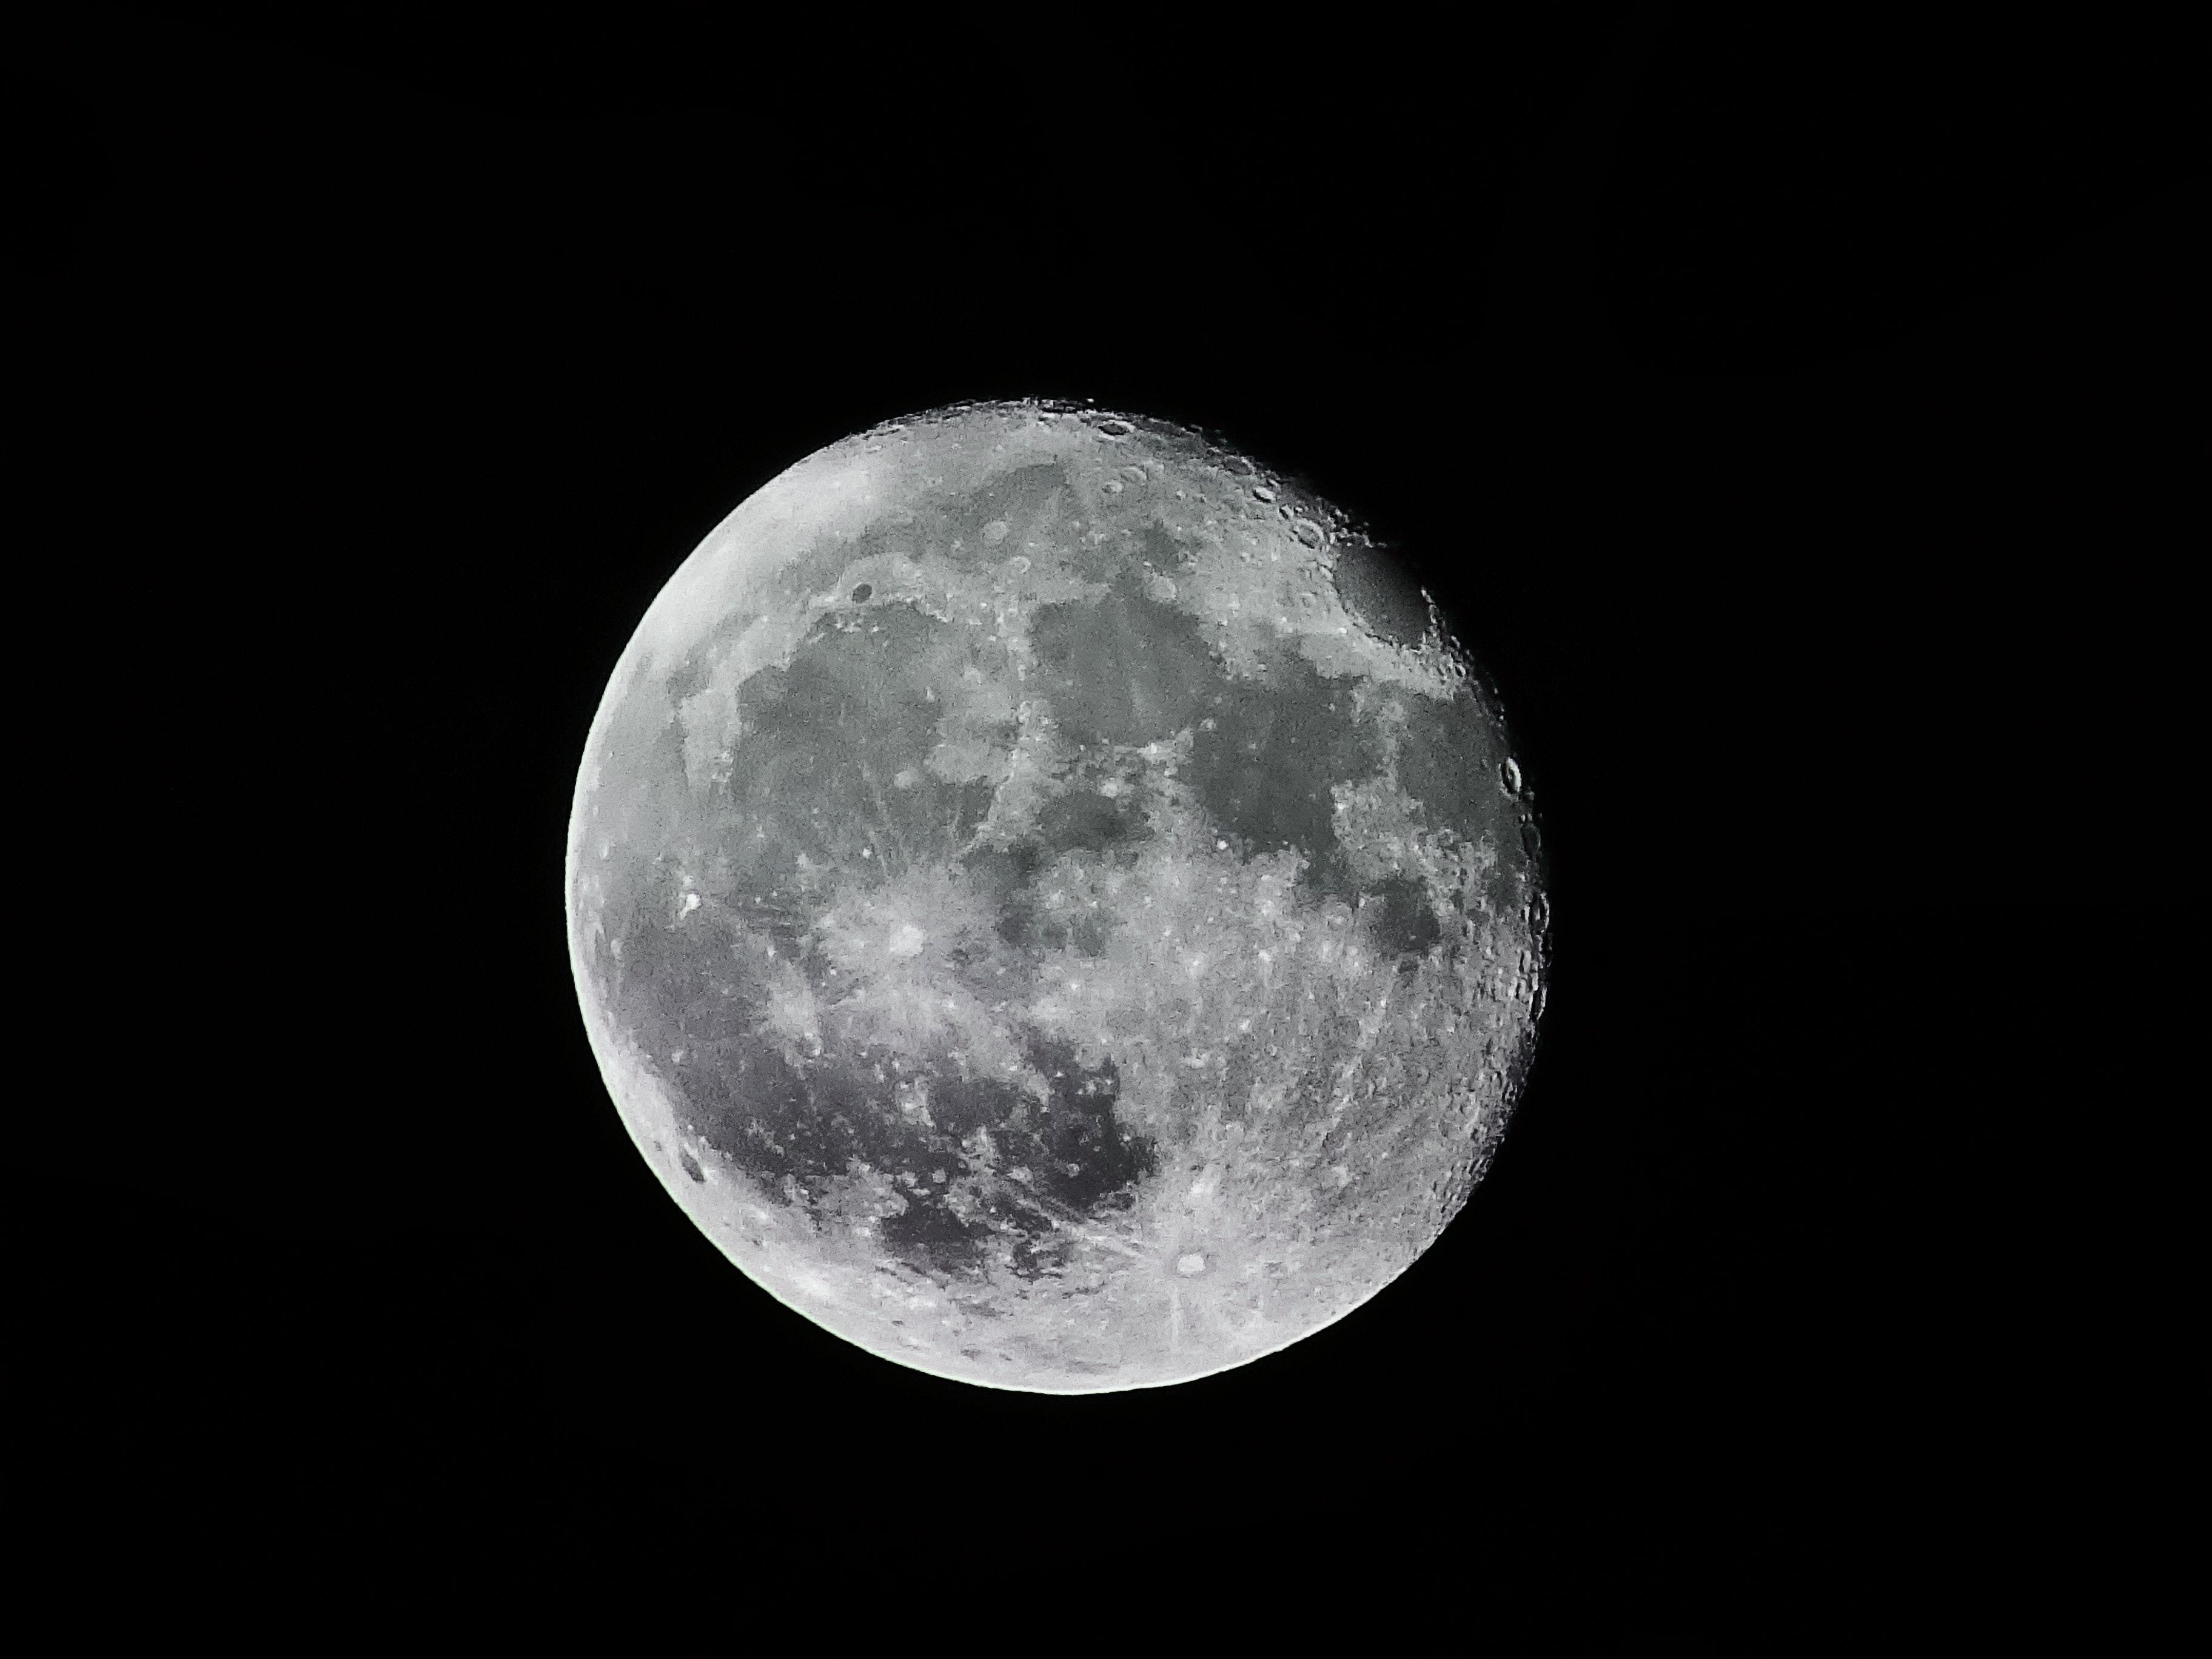 astrologi, astronomi, atmosfære